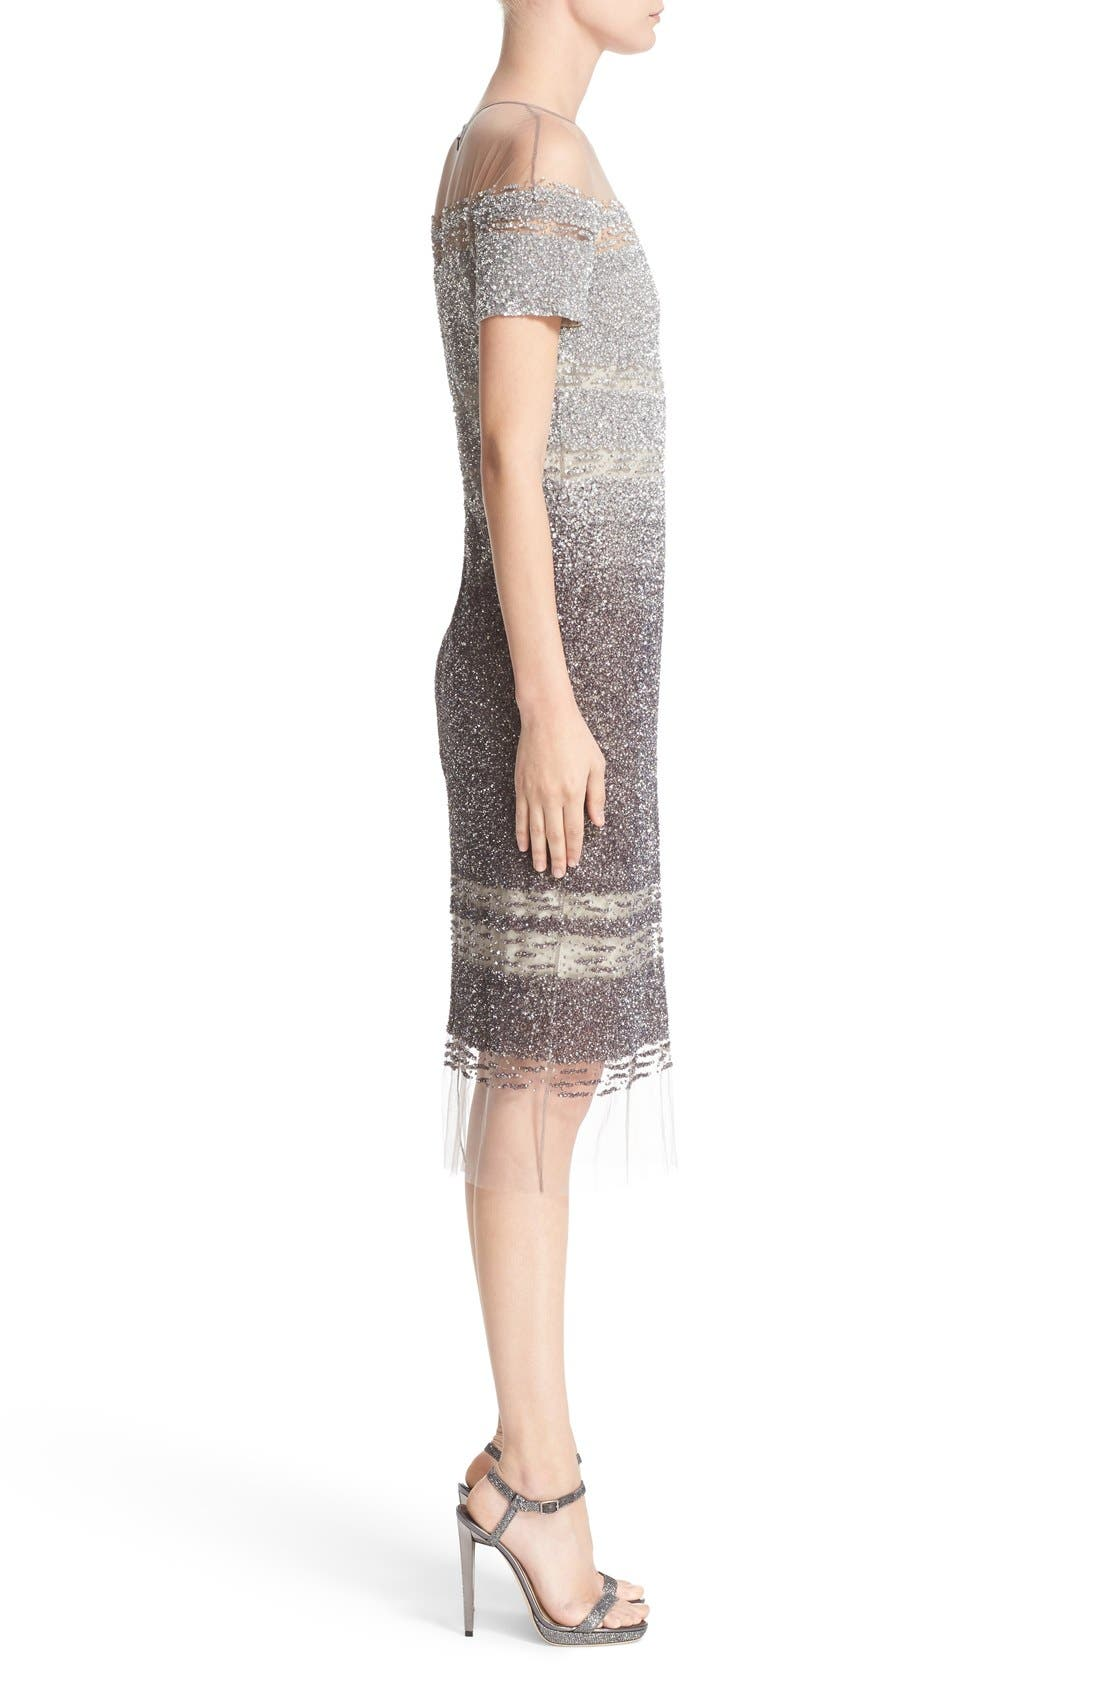 Signature Sequin Cap Sleeve Cocktail Dress,                             Alternate thumbnail 5, color,                             SILVER/ DARK GREY